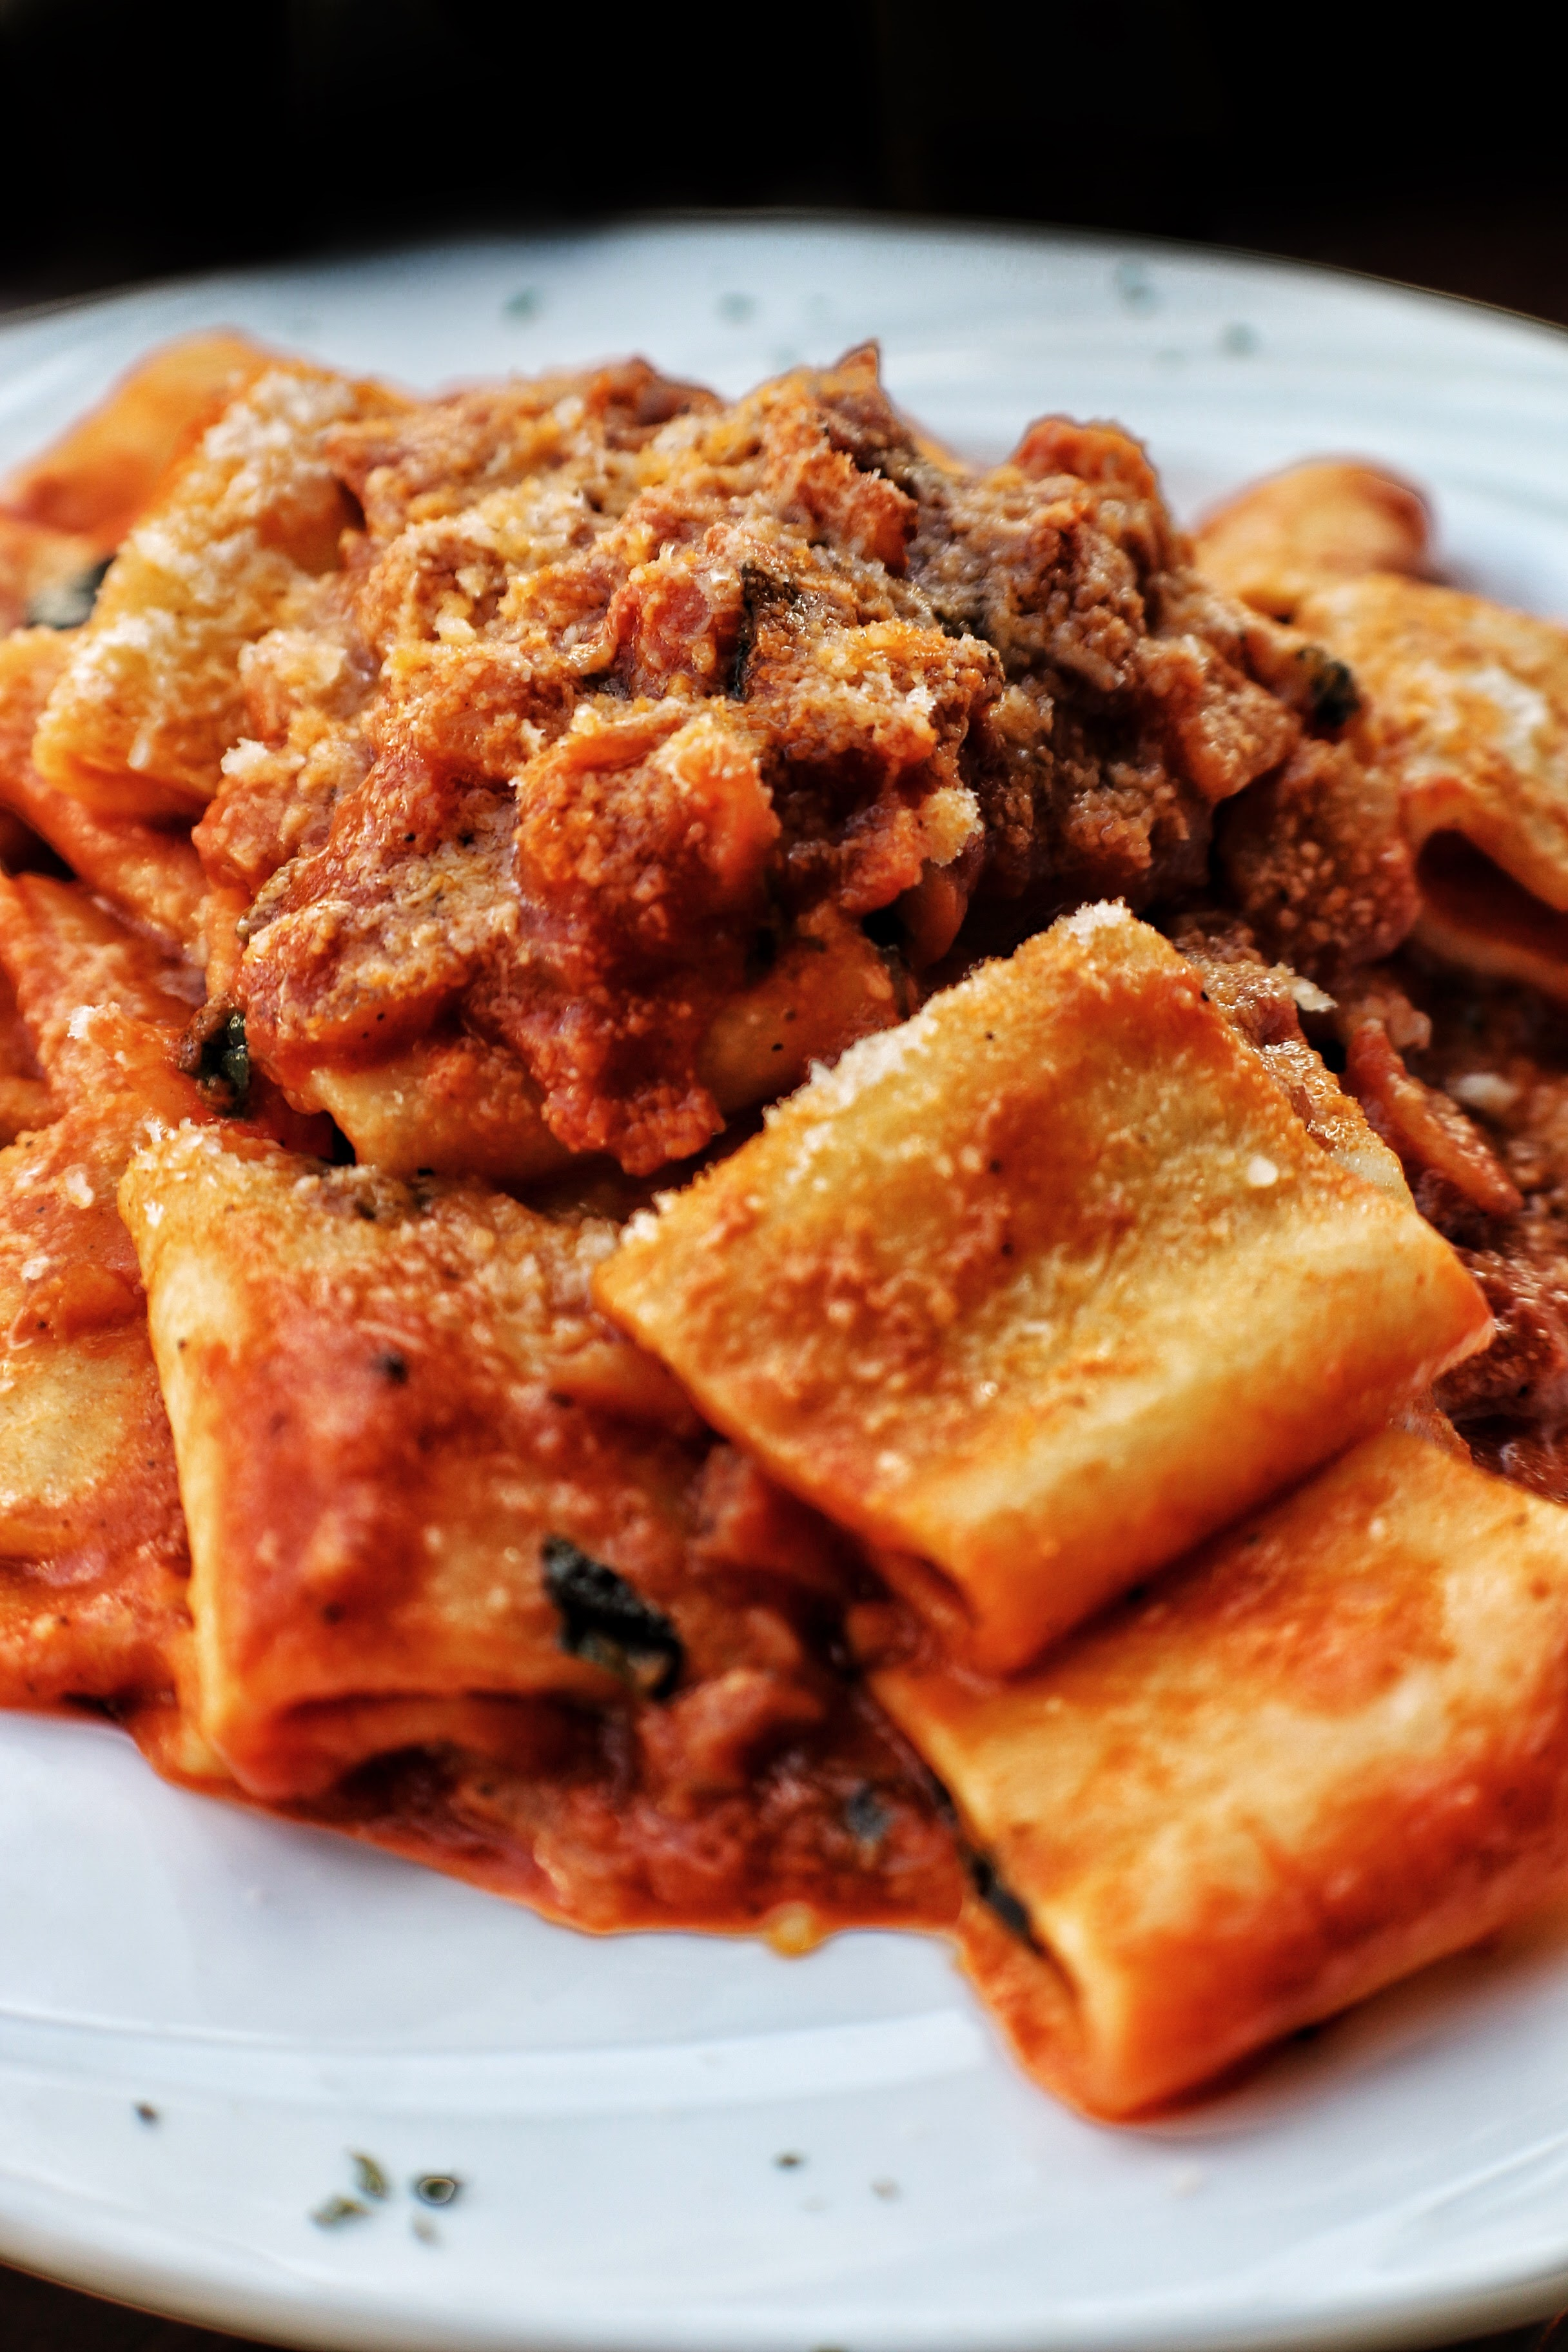 Paccheri alla Matriciana   Paccheri Pasta, Pancetta, Onions, Tomato Sauce, Pecorino Romano